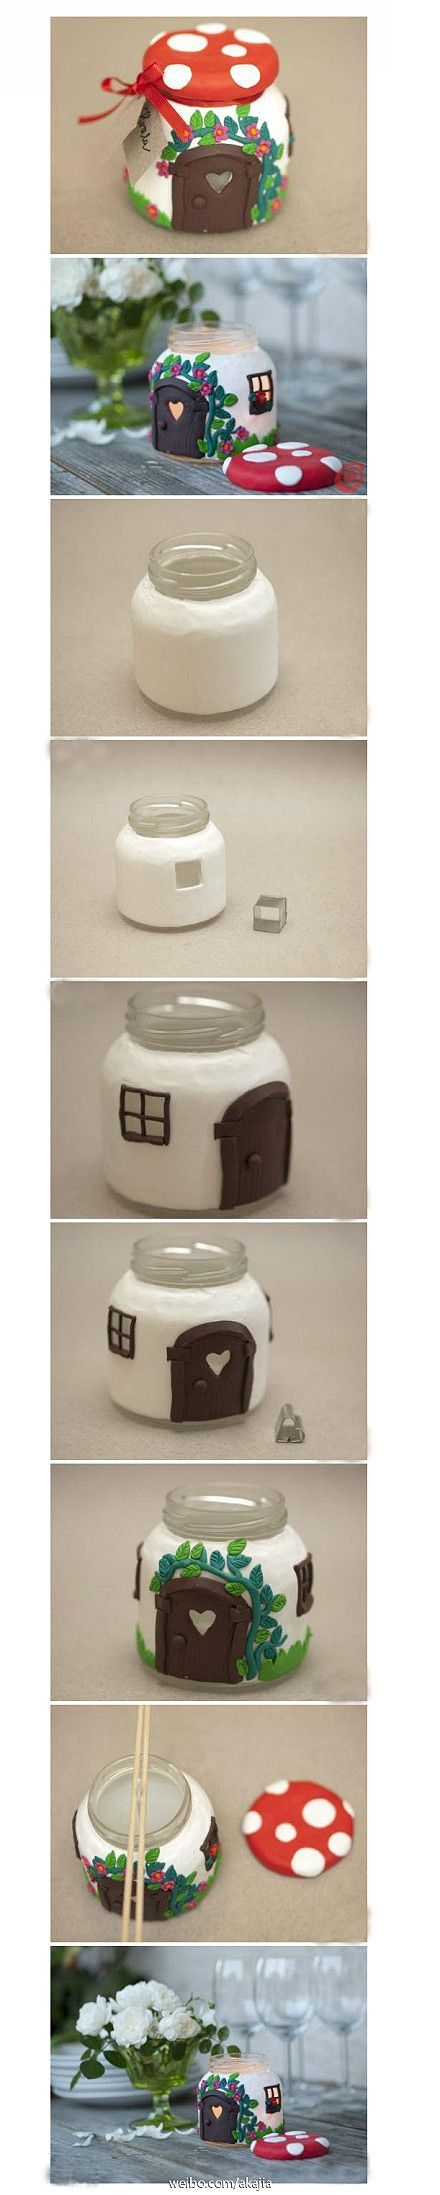 Handmade DIY waste glass bottles plus light clay -